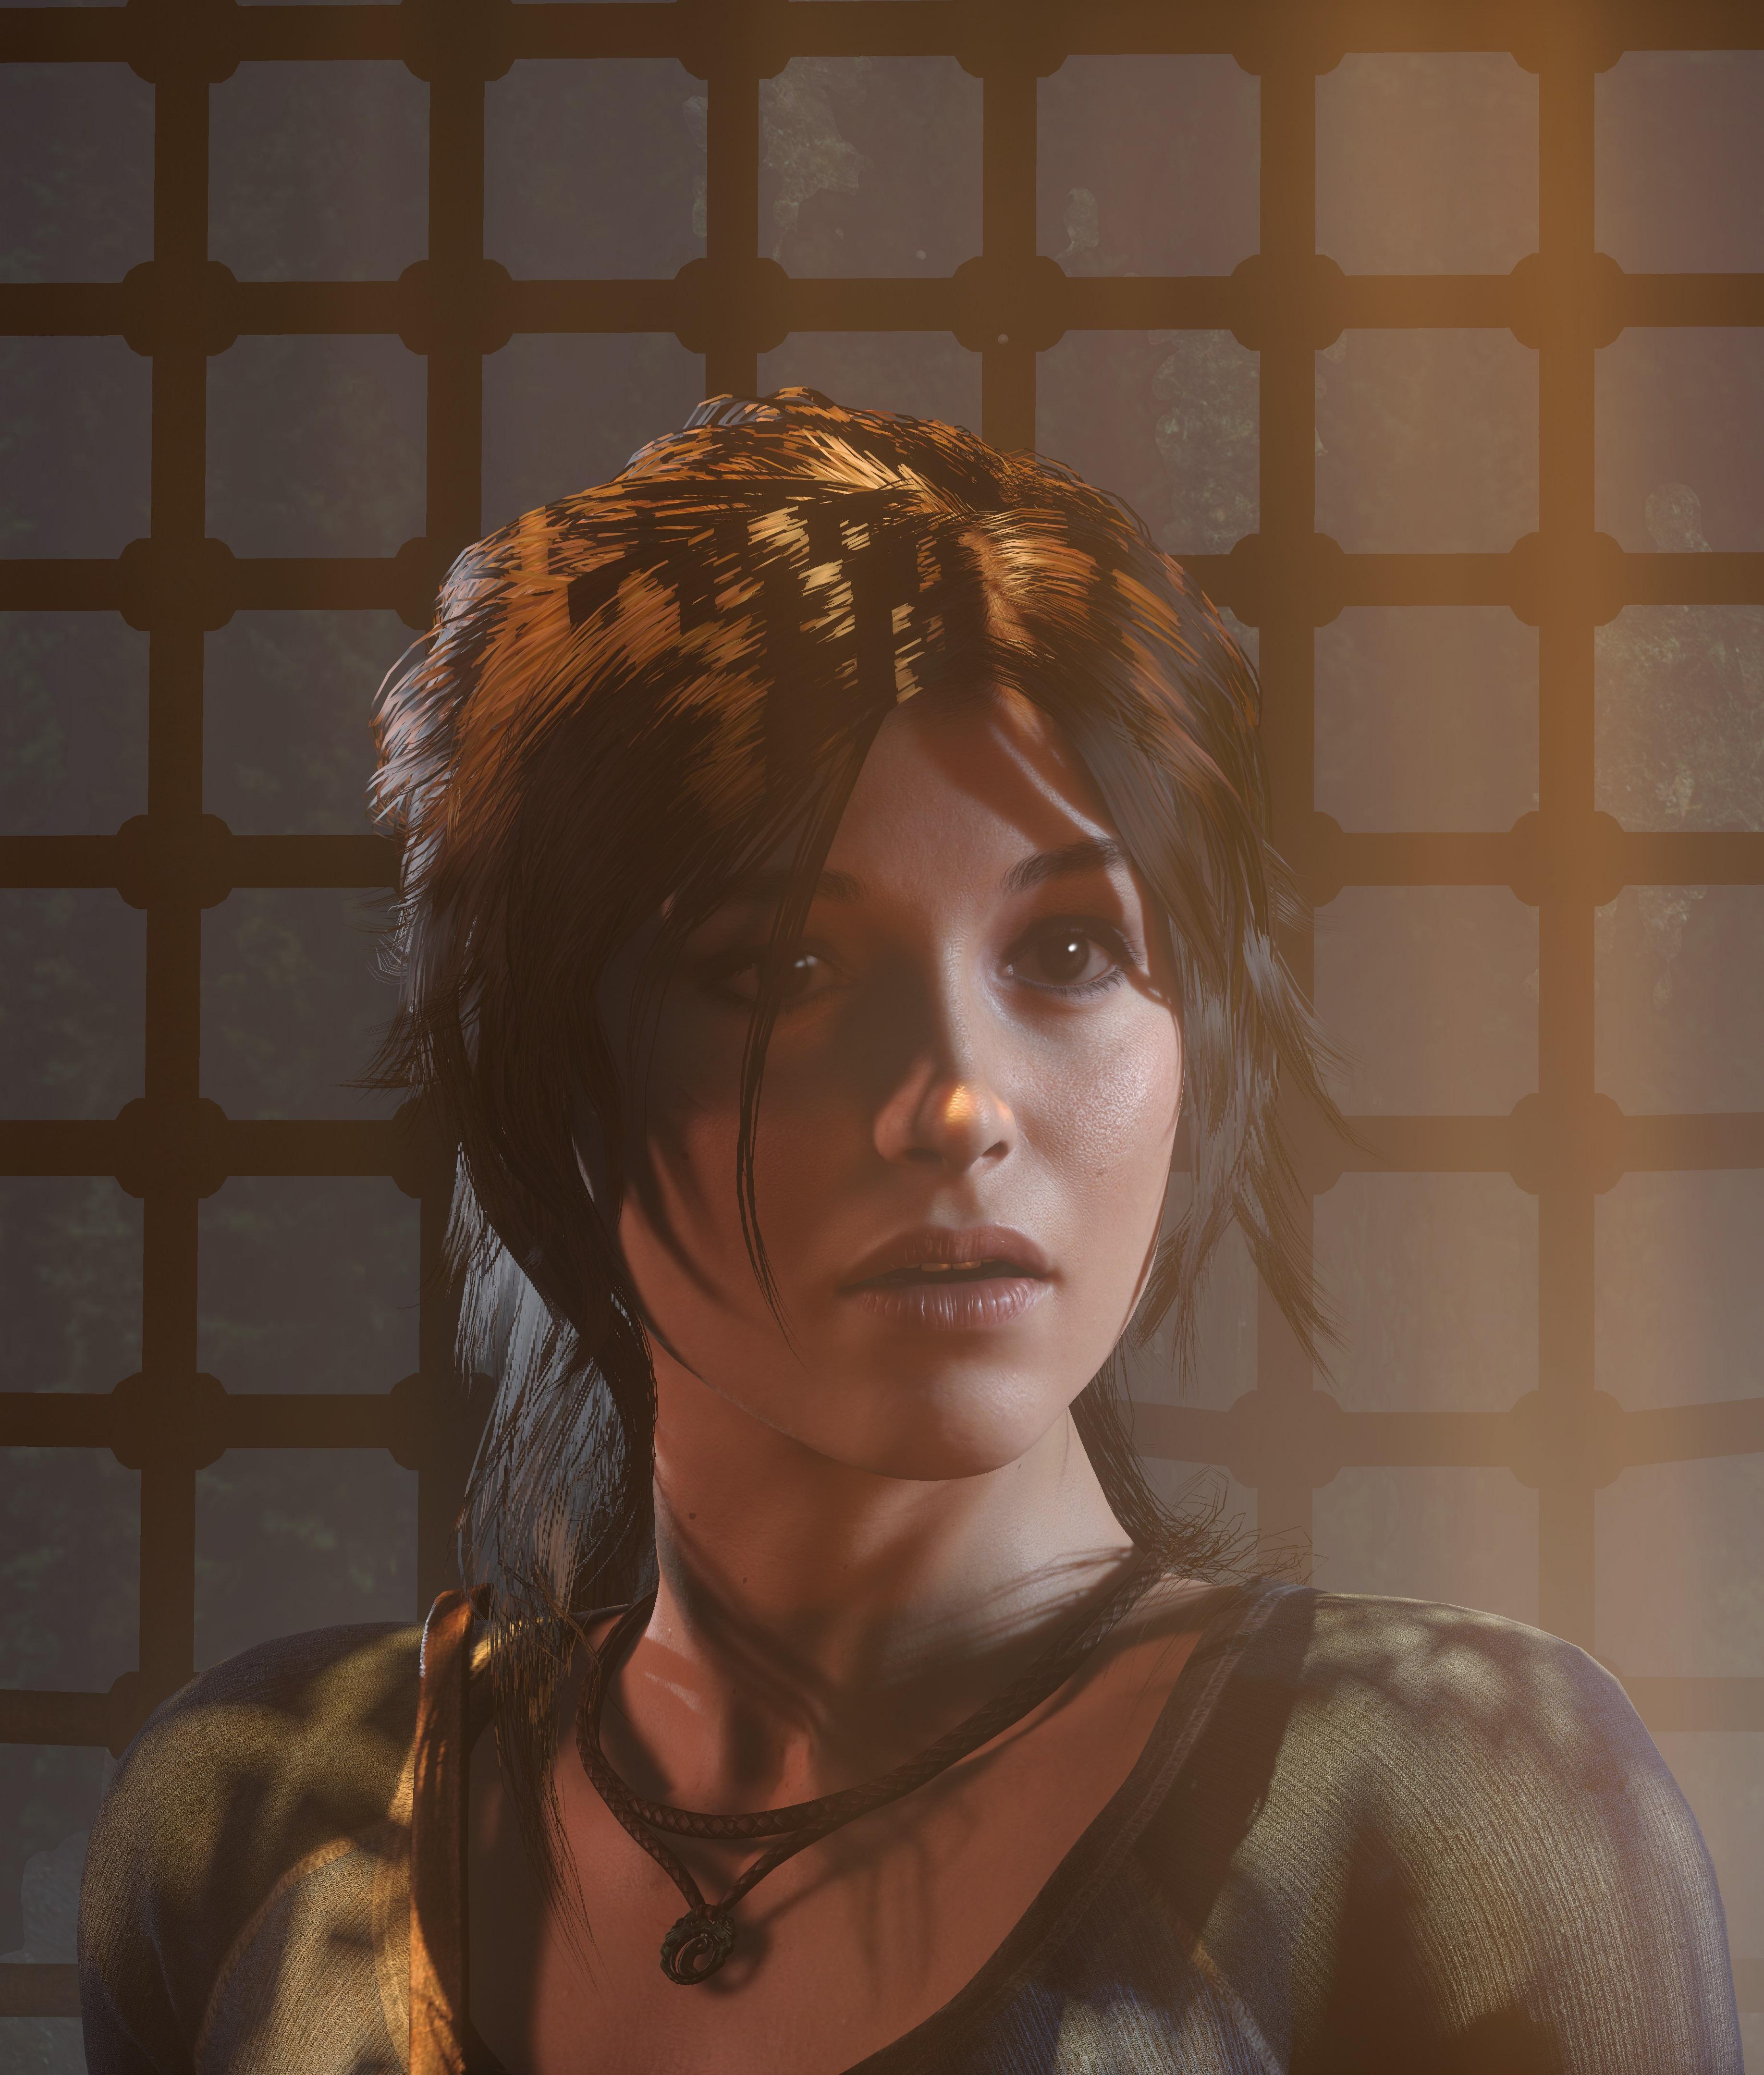 Rise of the Tomb Raider - Rise of the Tomb Raider 4K